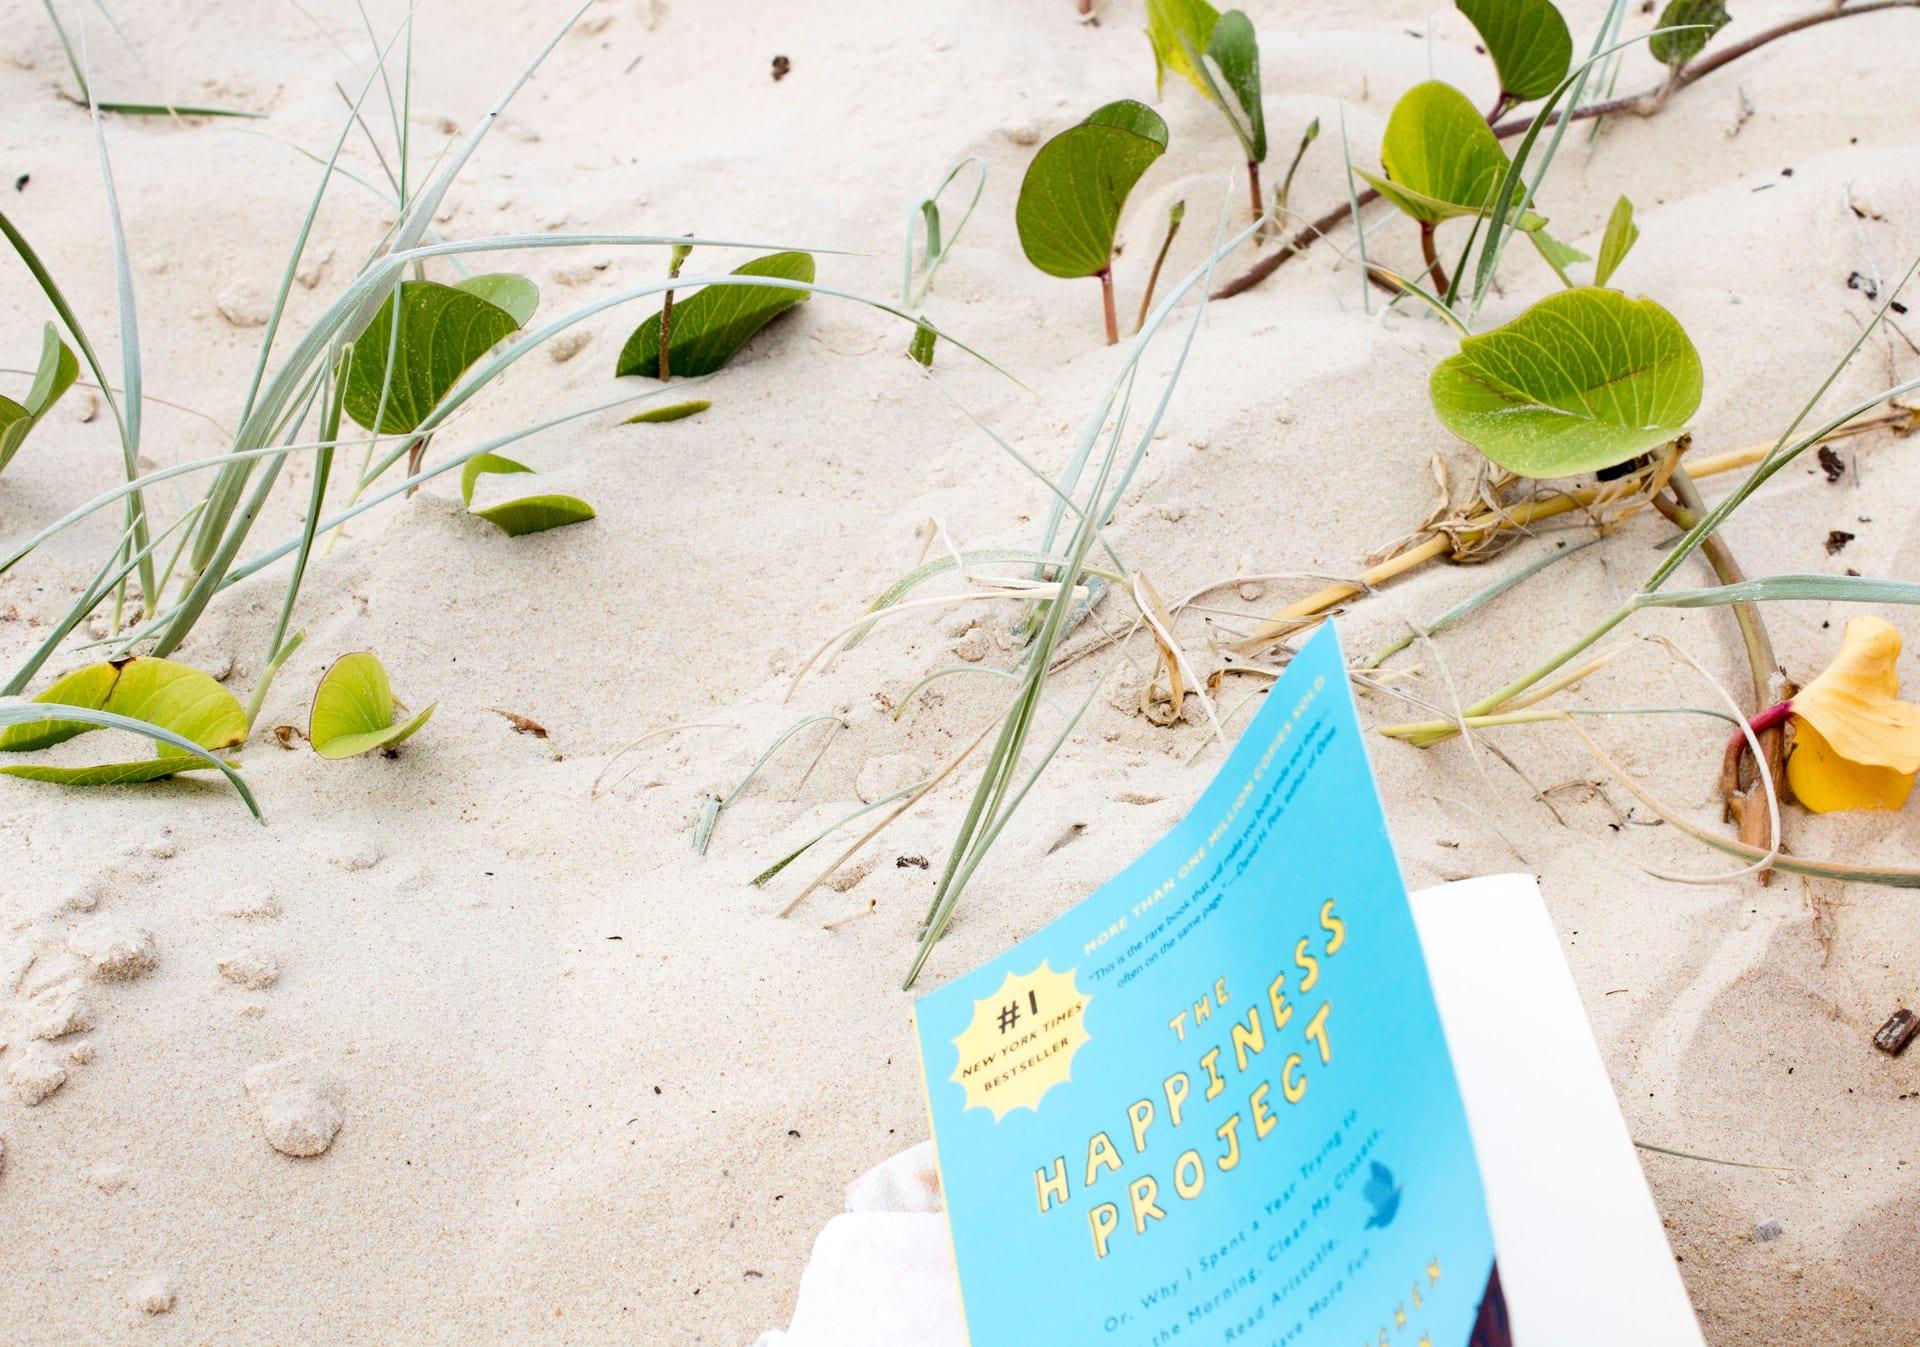 livros na praia